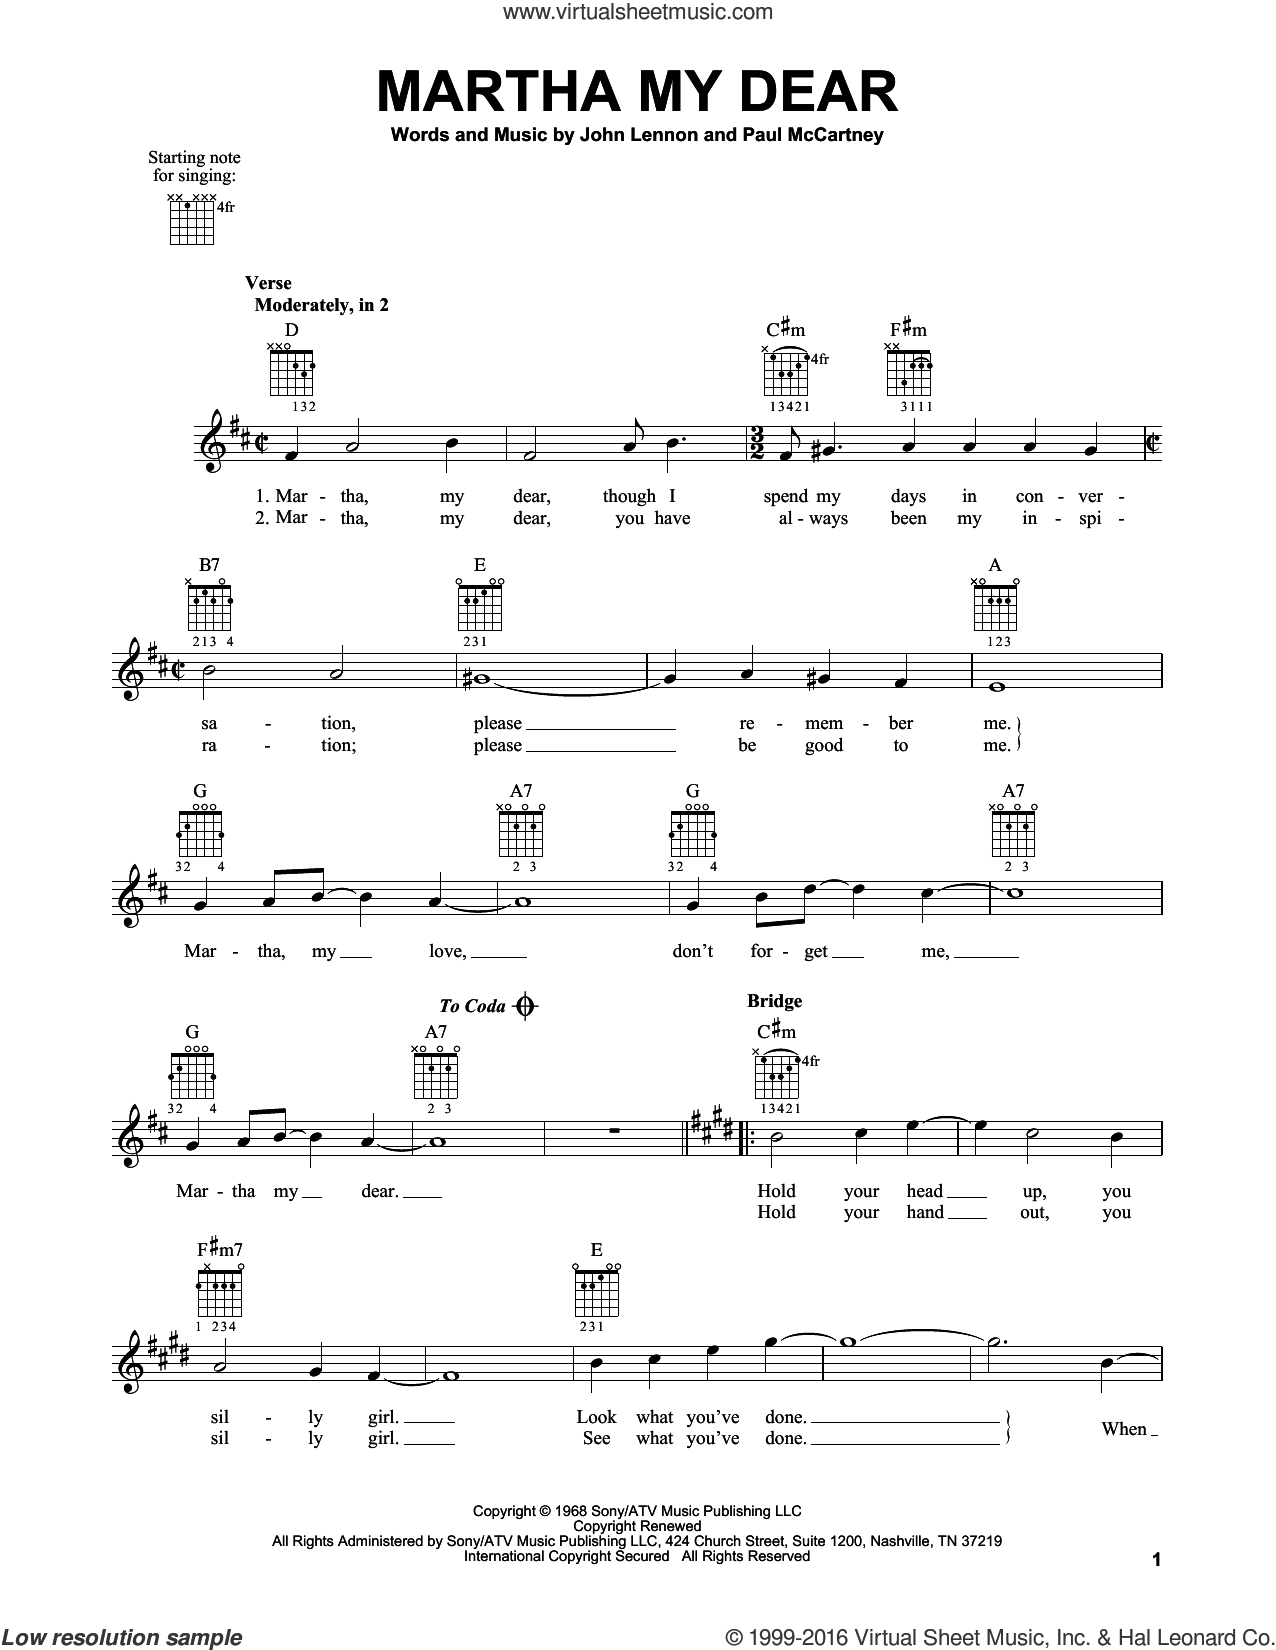 Dear john guitar chords gallery guitar chords examples beatles martha my dear sheet music for guitar solo chords martha my dear sheet music for hexwebz Image collections